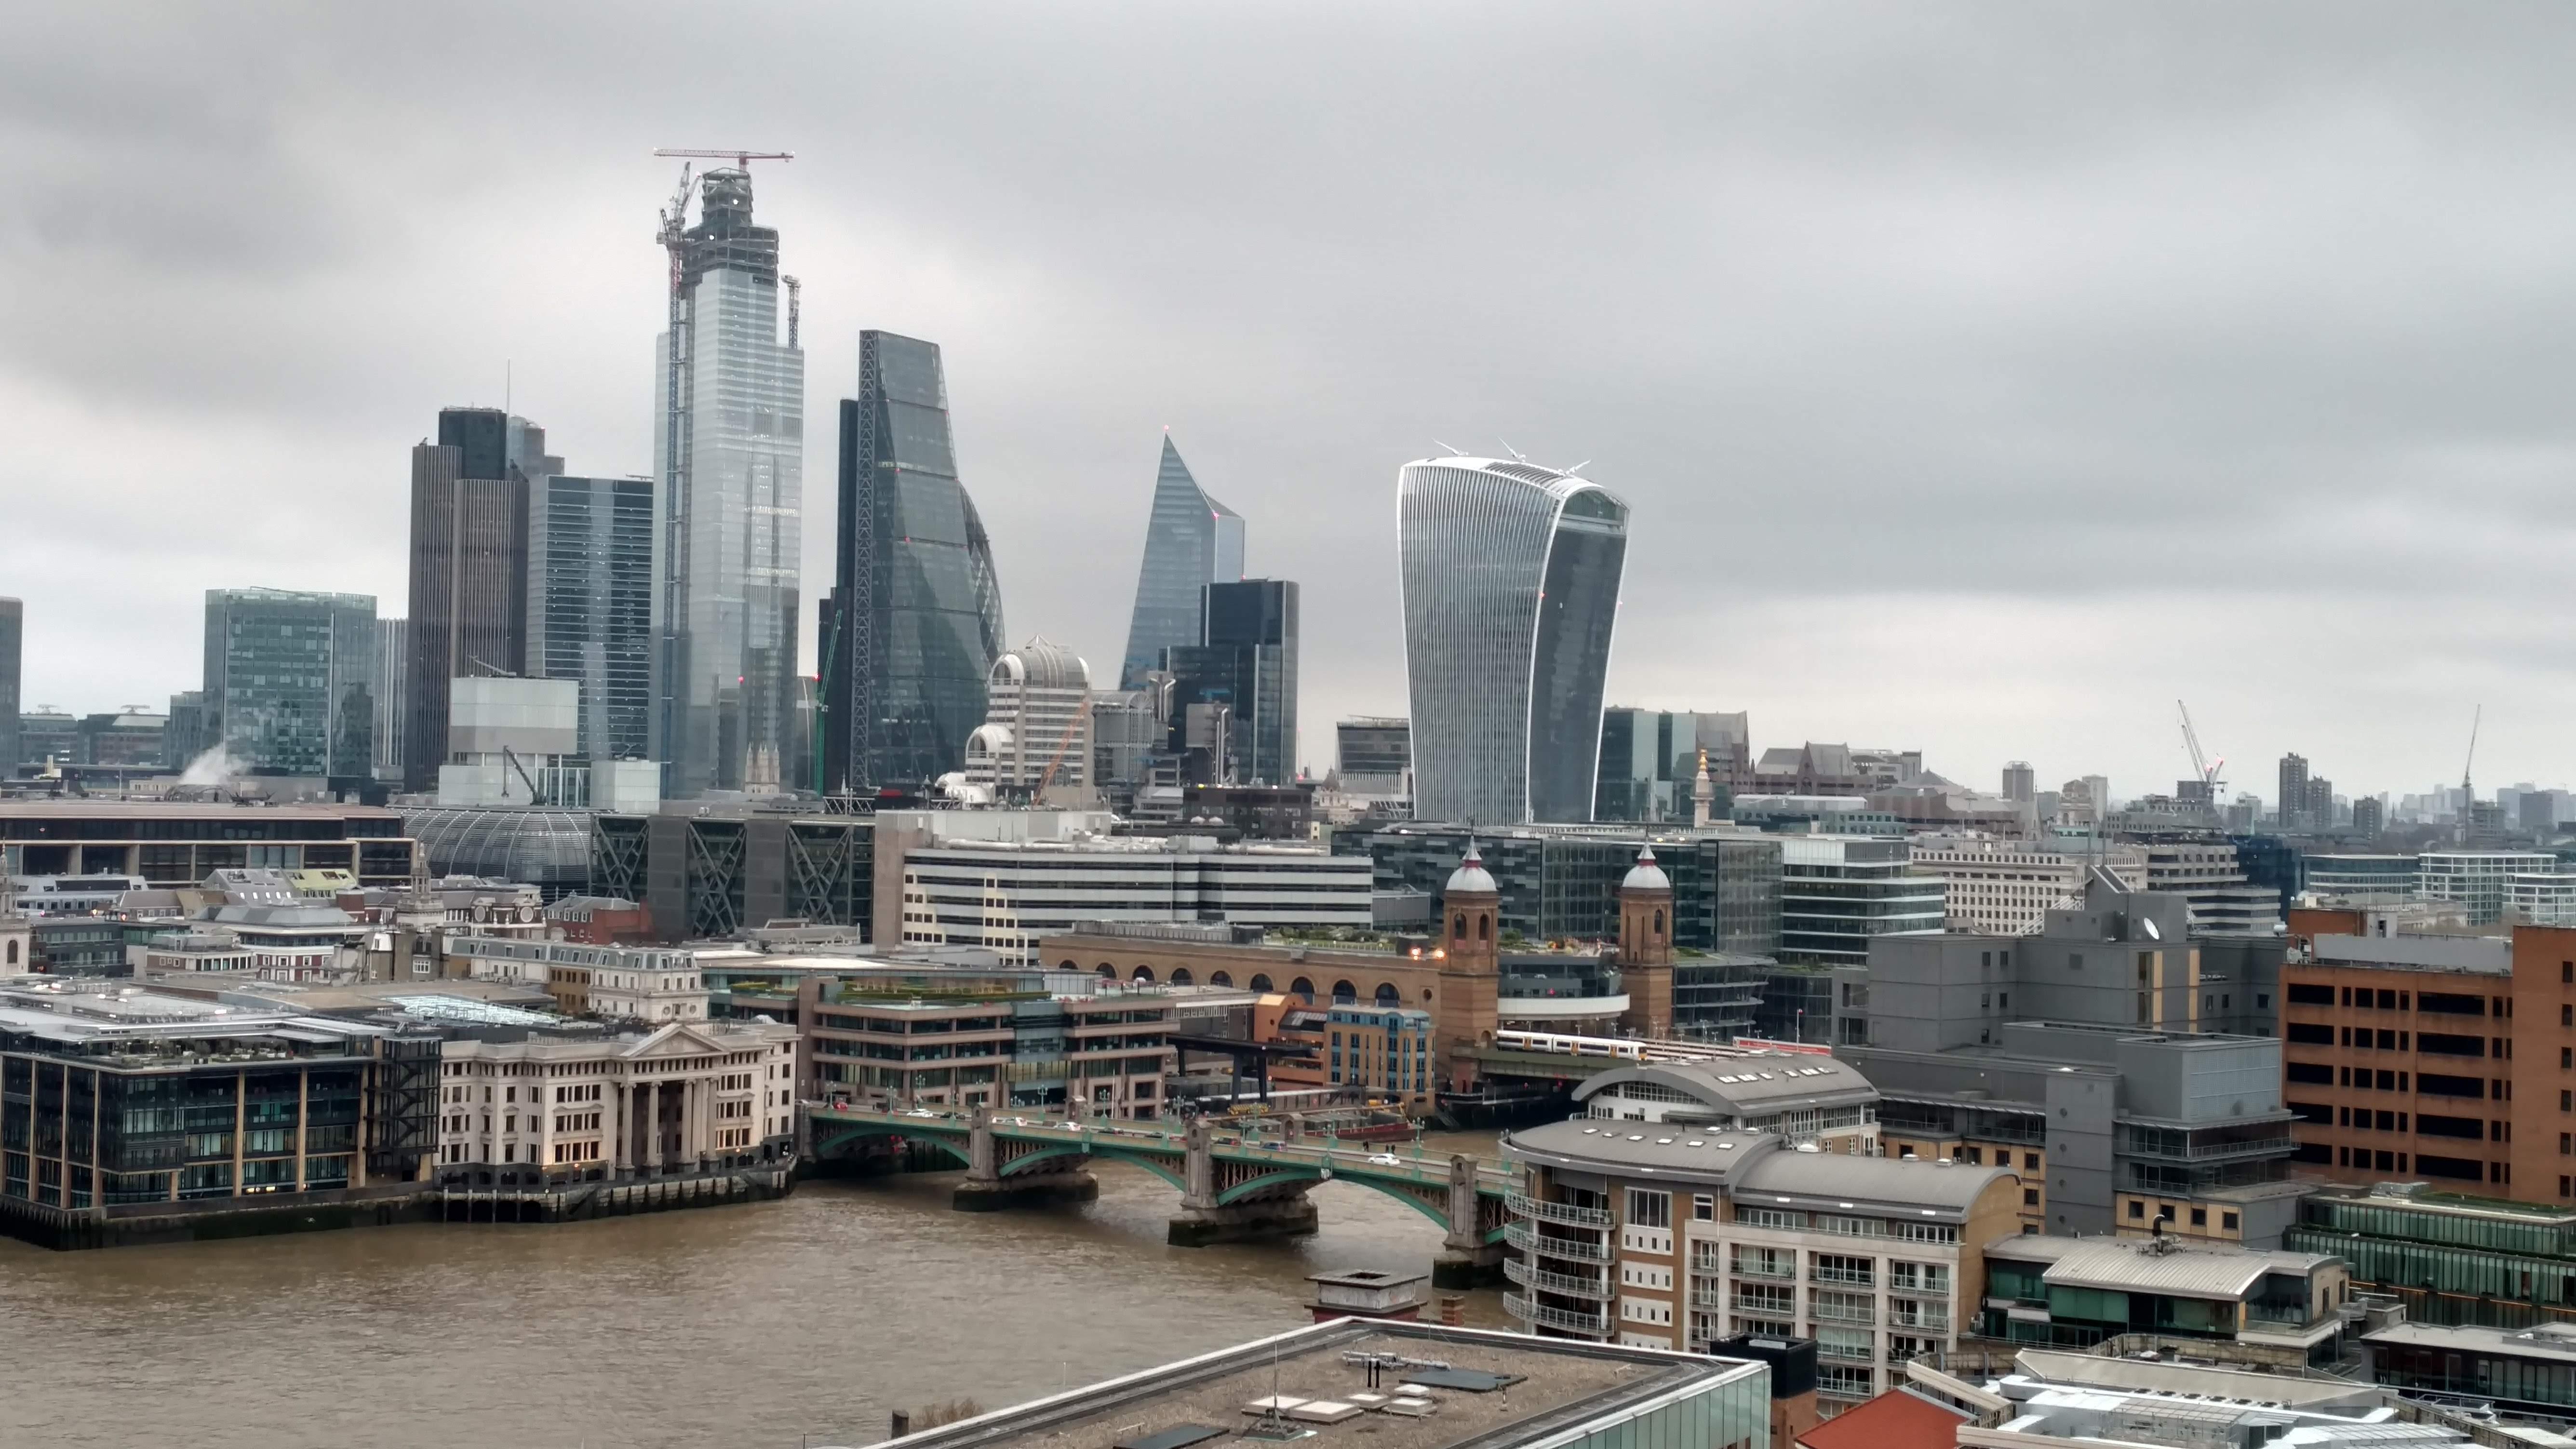 Vista desde el Tate Modern Museum